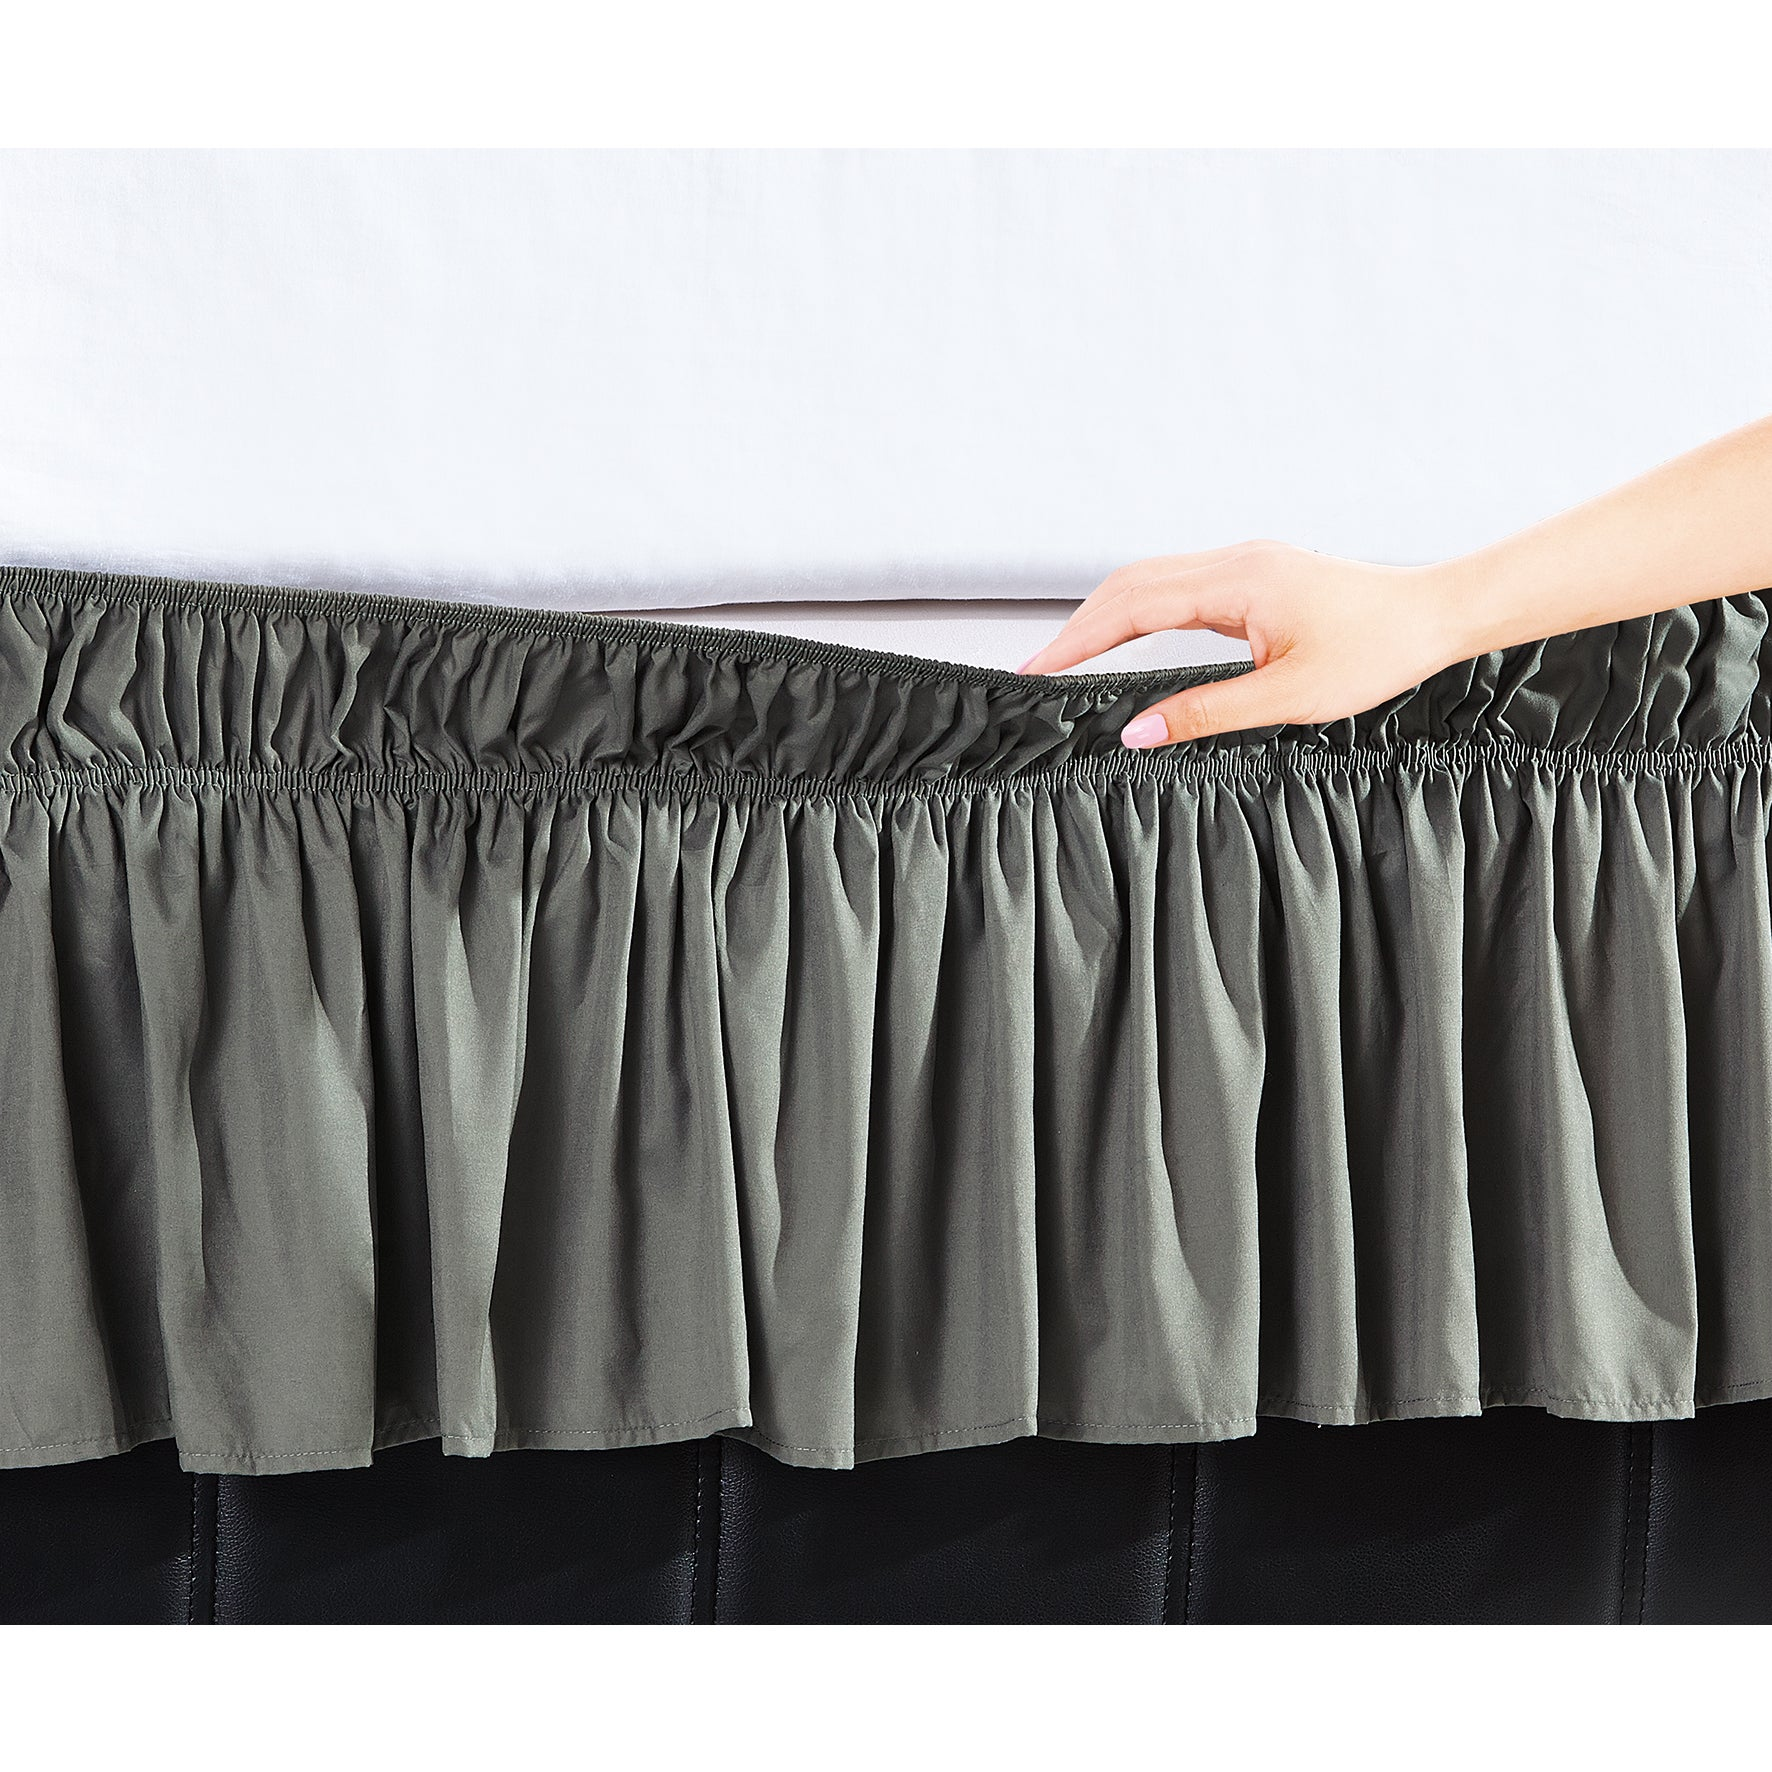 Copper Grove Yarrow Easy Wrap Platform Free 16 Inch Drop Bed Skirt Overstock 20370465